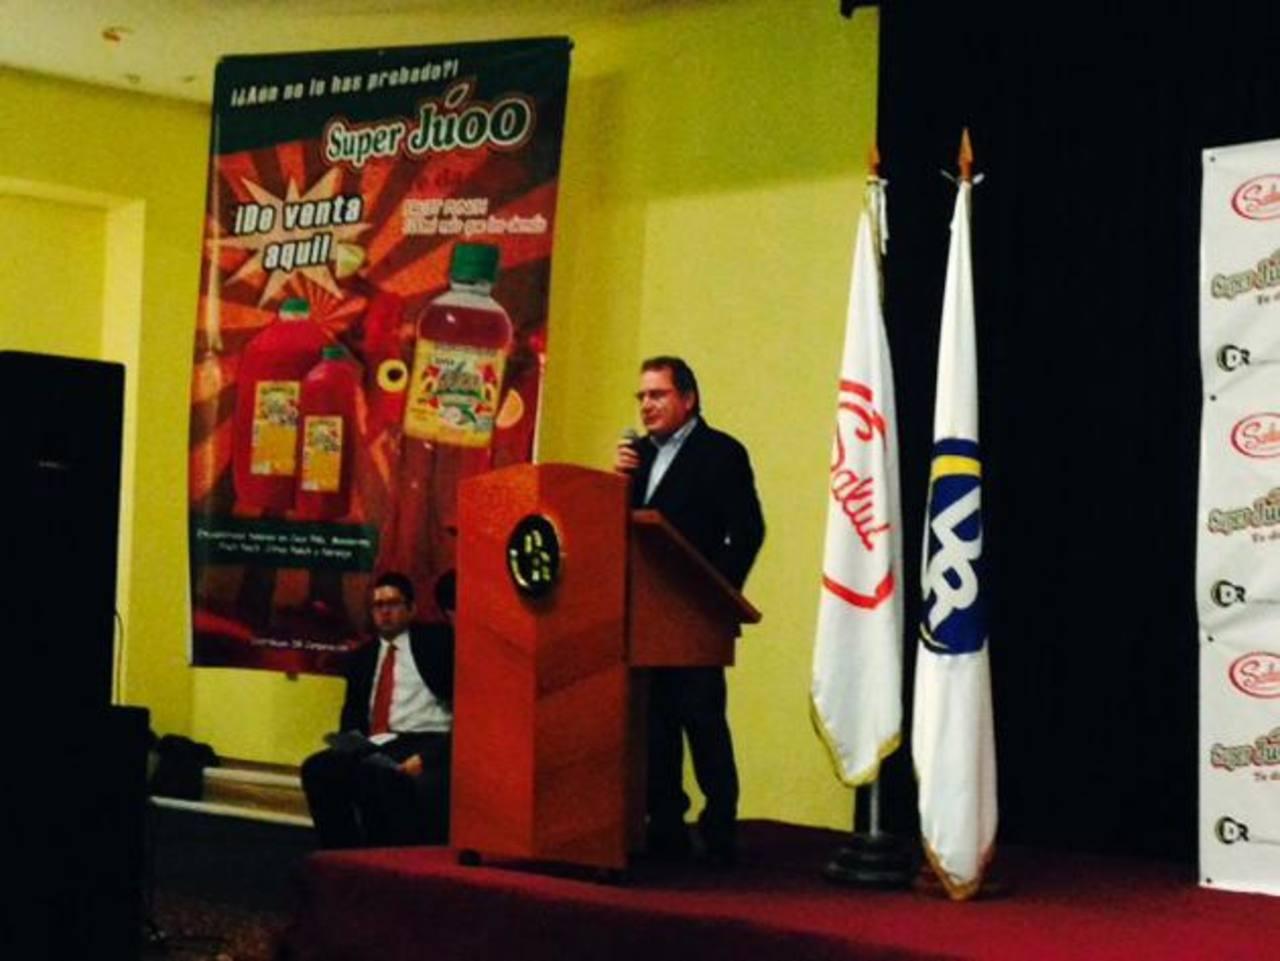 La Salud ya exporta jugos a Guatemala